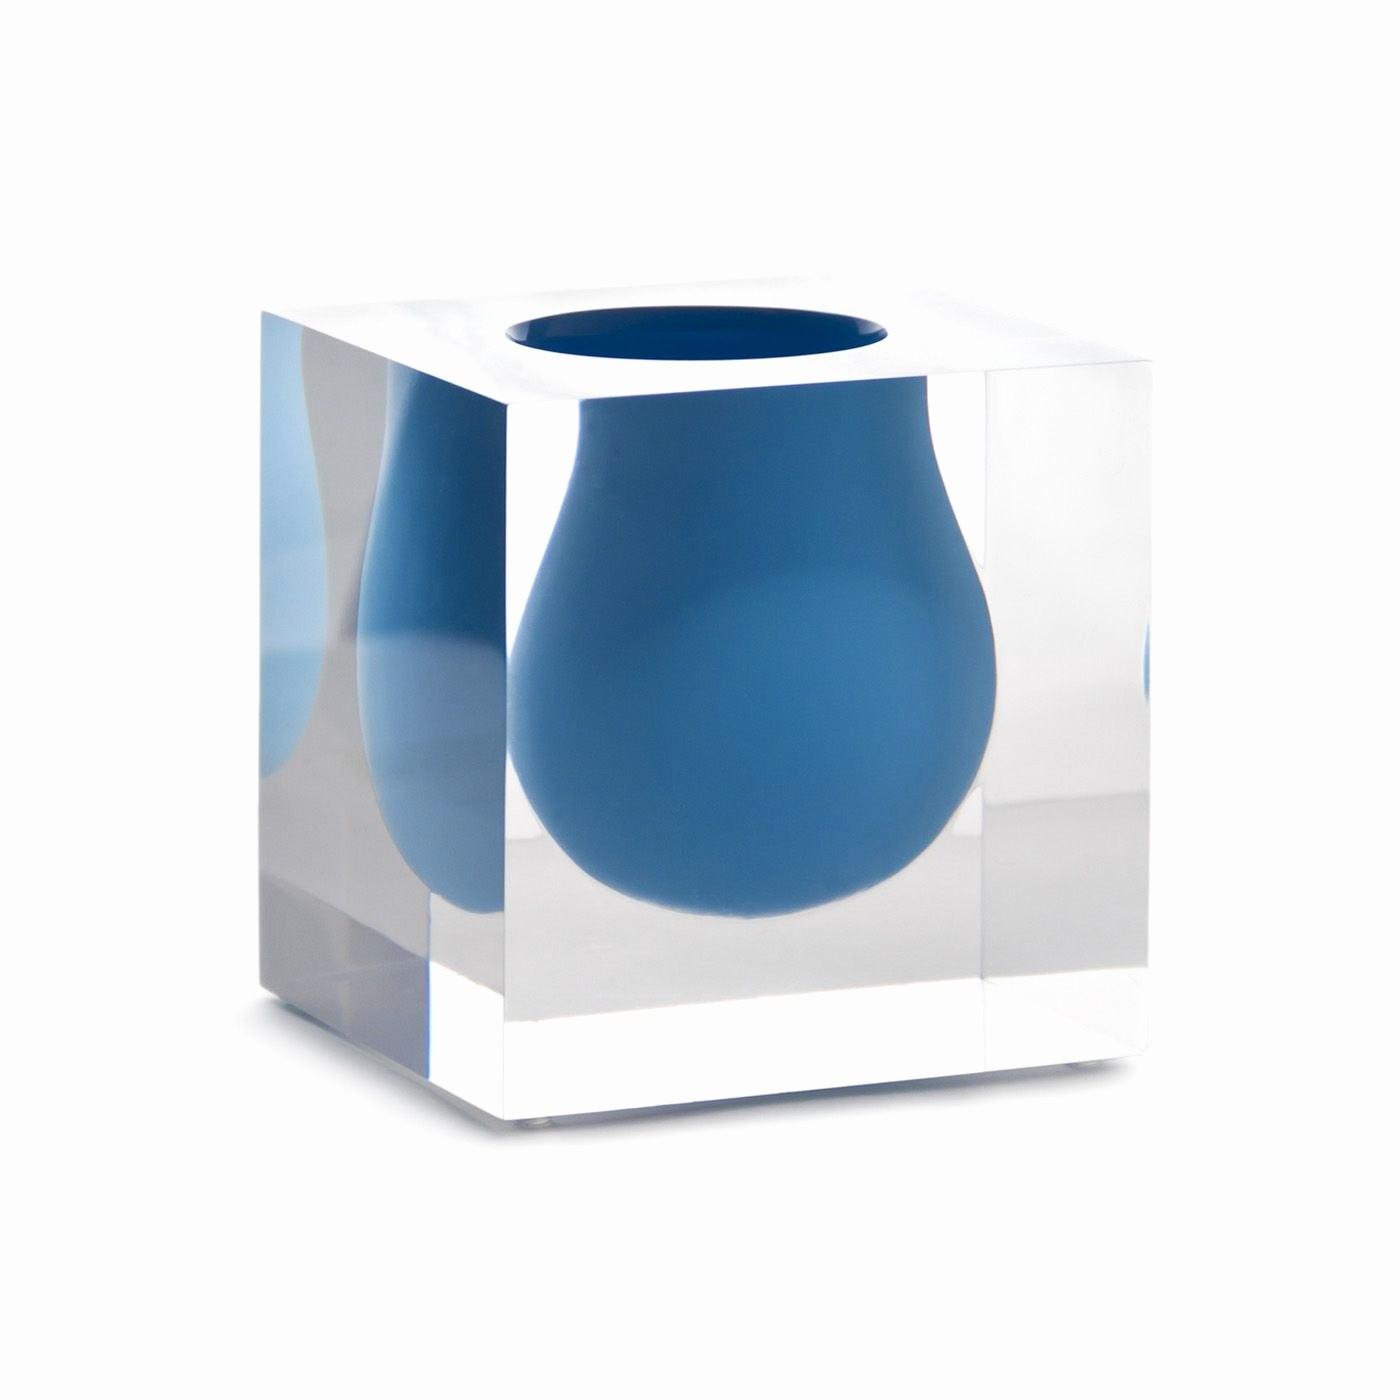 cobalt blue glass vases wholesale of 20 unique very tall decorative vases bogekompresorturkiye com regarding vases for home decor unique home decor vases unique d dkbrw 5743 1h vases tall wood